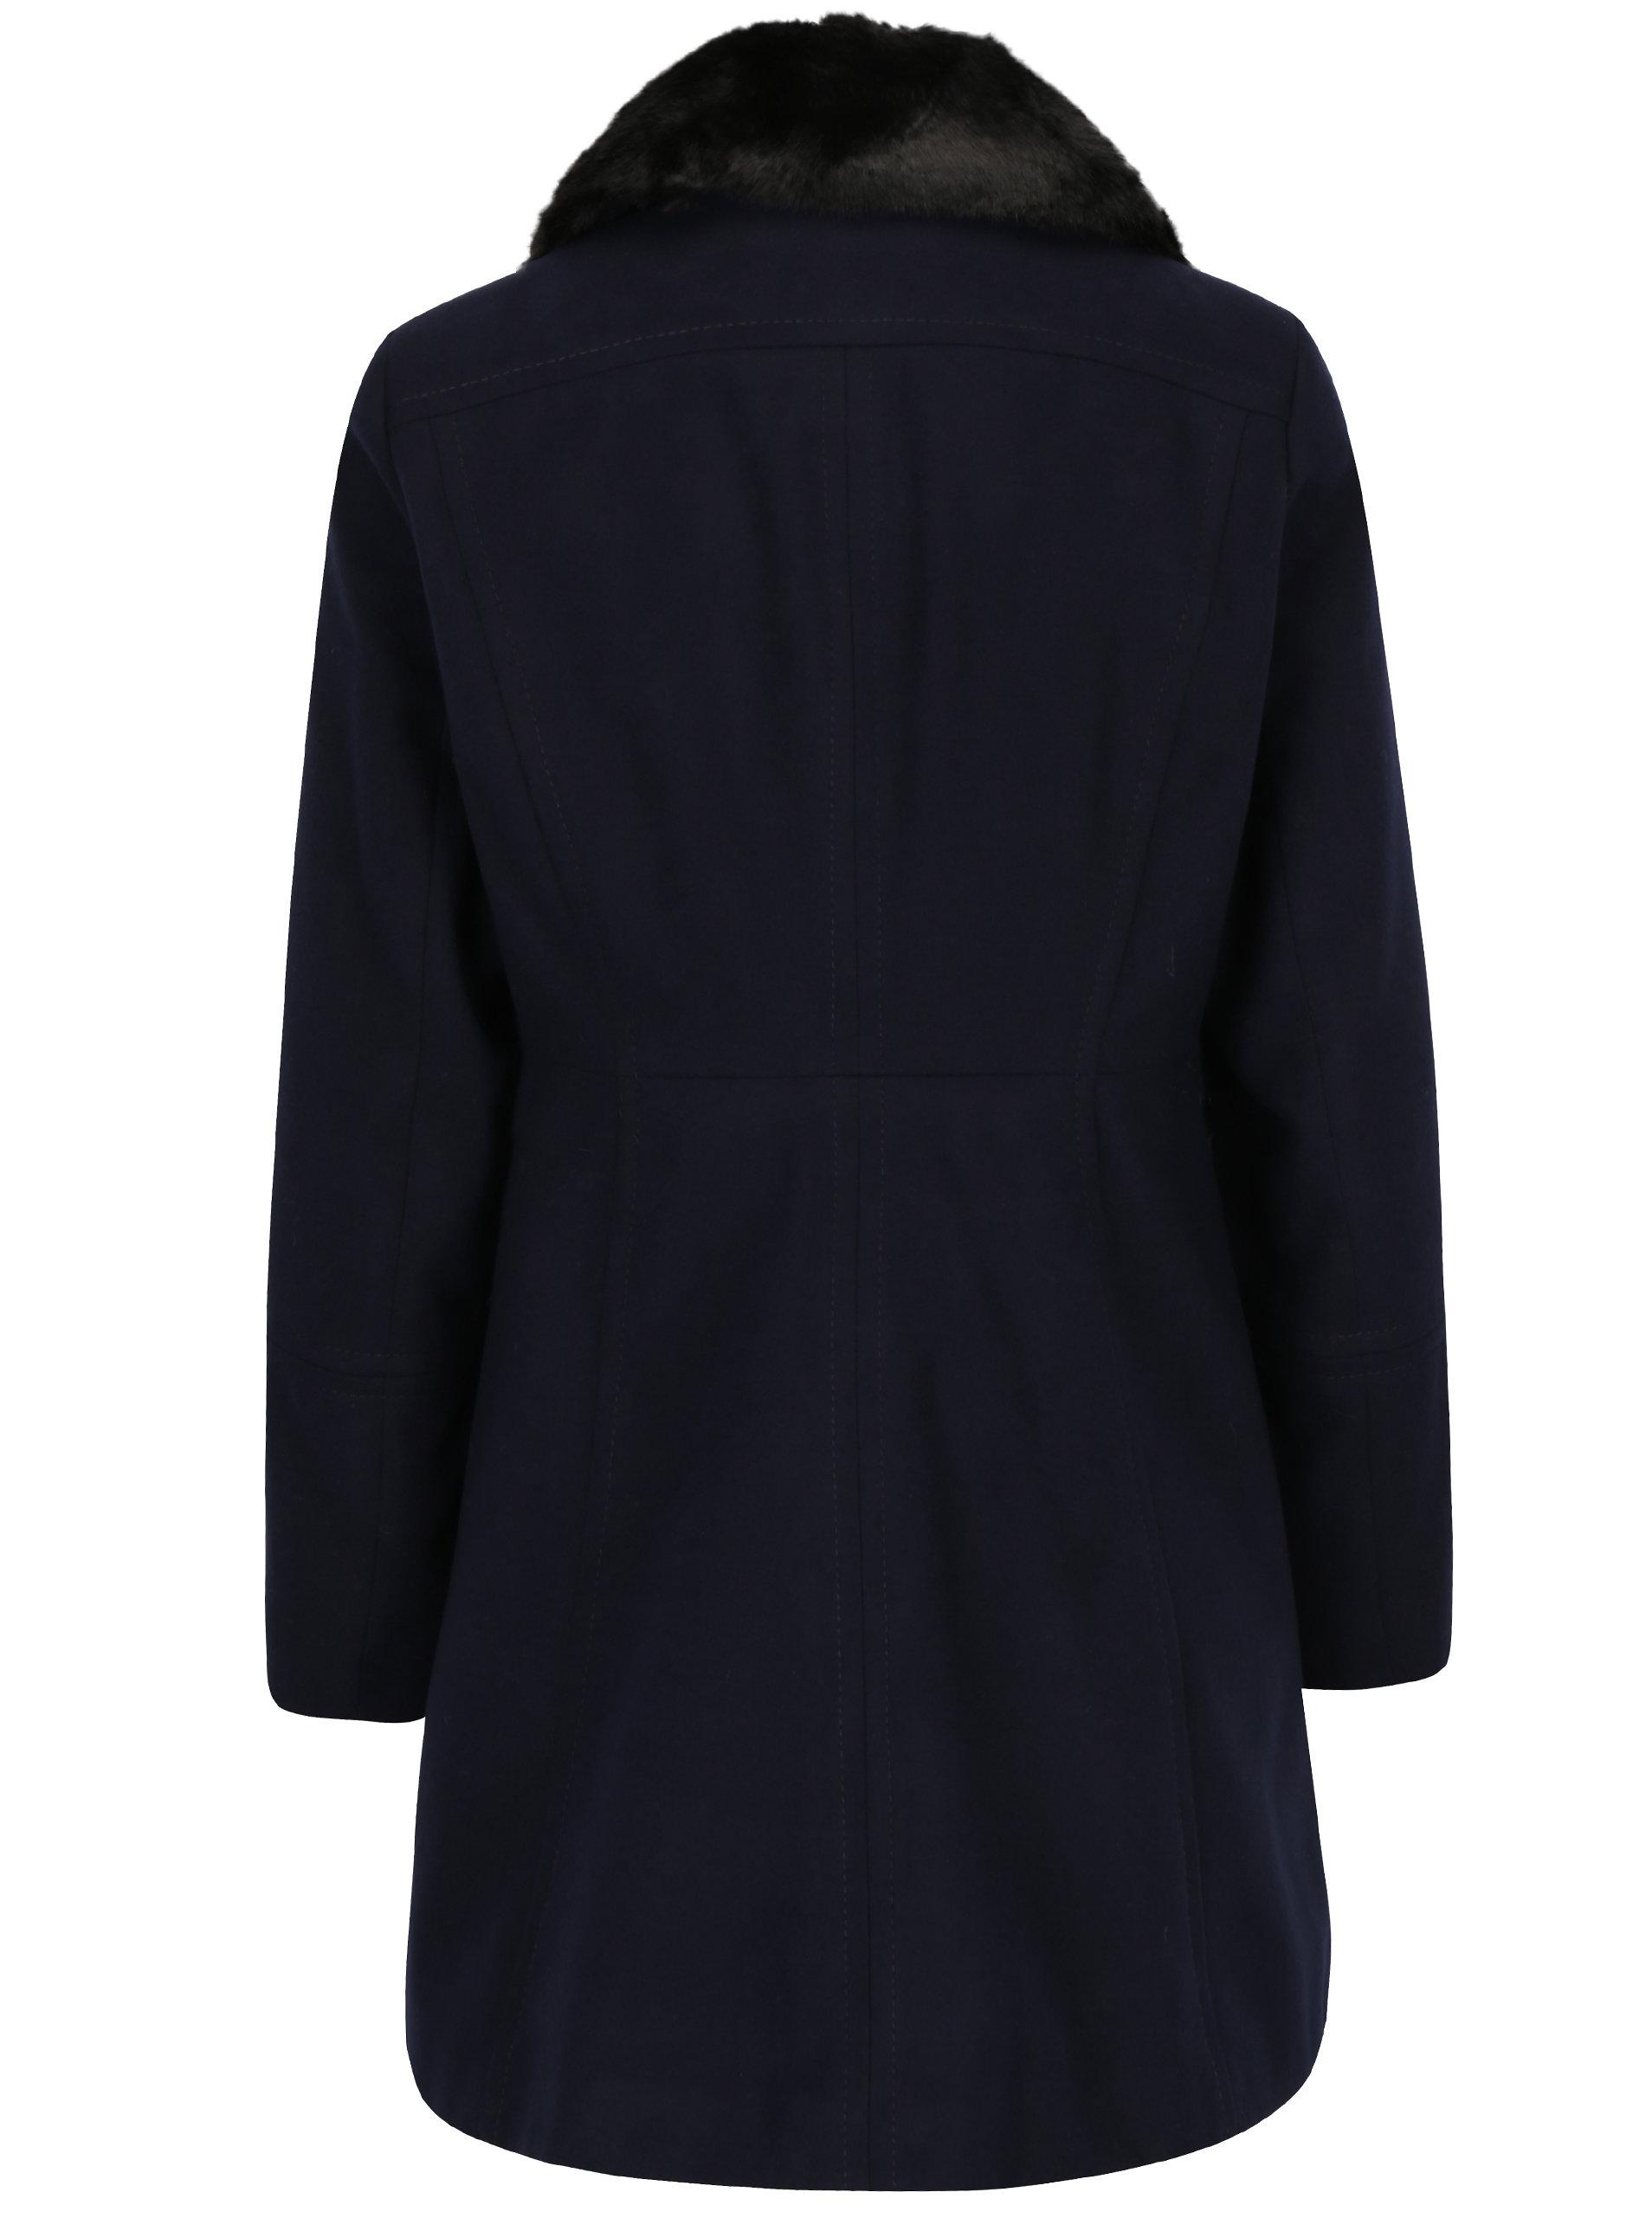 f49343eed Tmavomodrý kabát s umelou kožušinou Dorothy Perkins Petite | ZOOT.sk